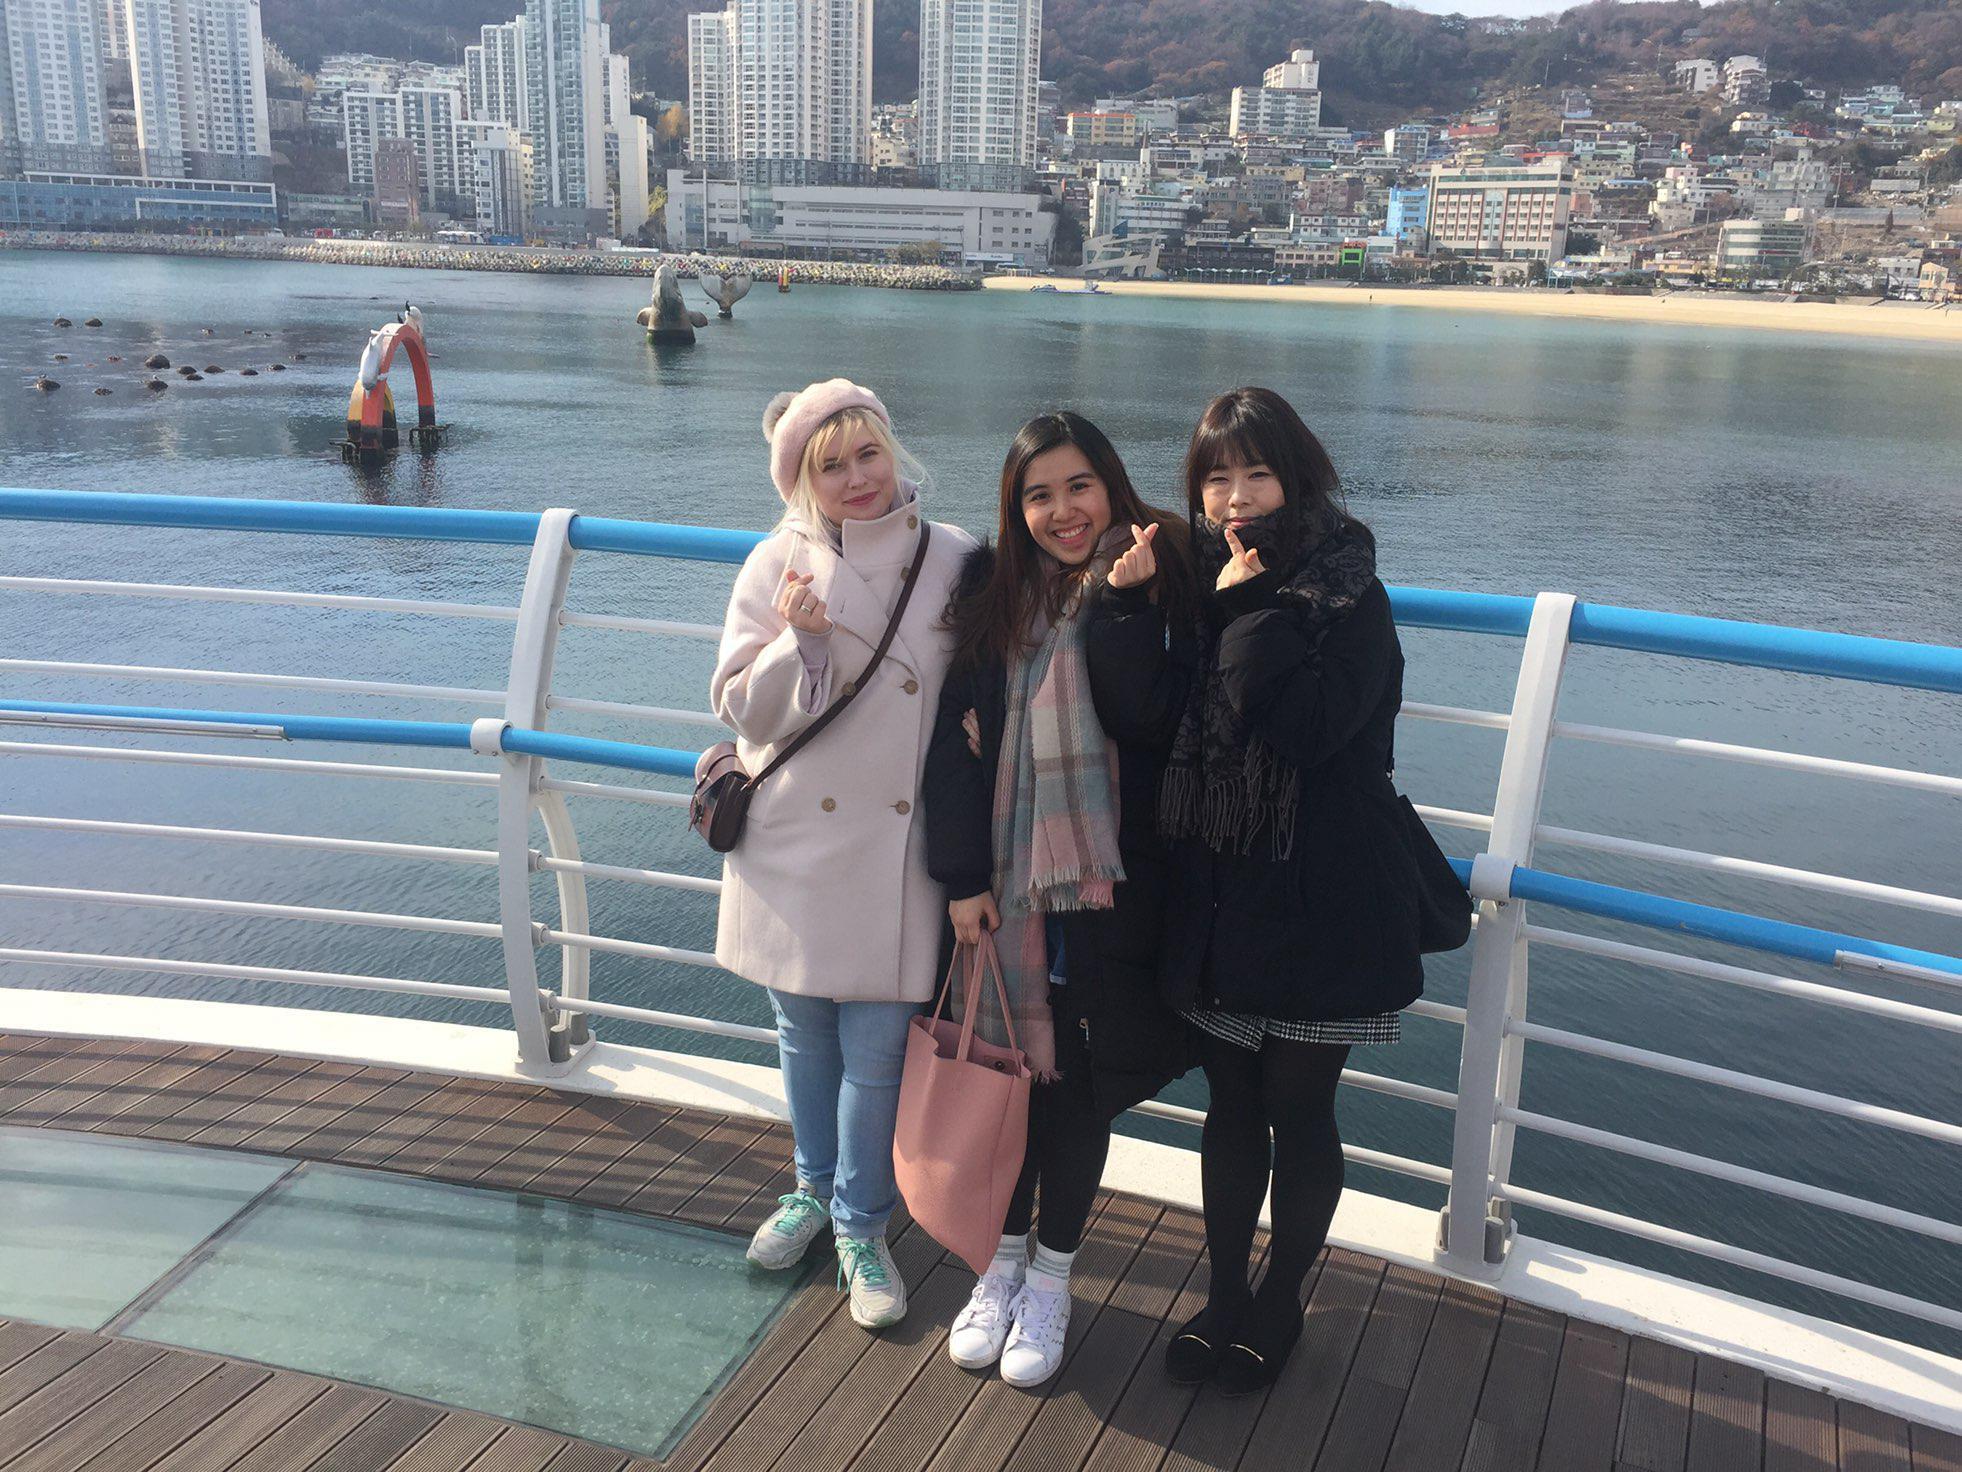 skywalk-with-friends